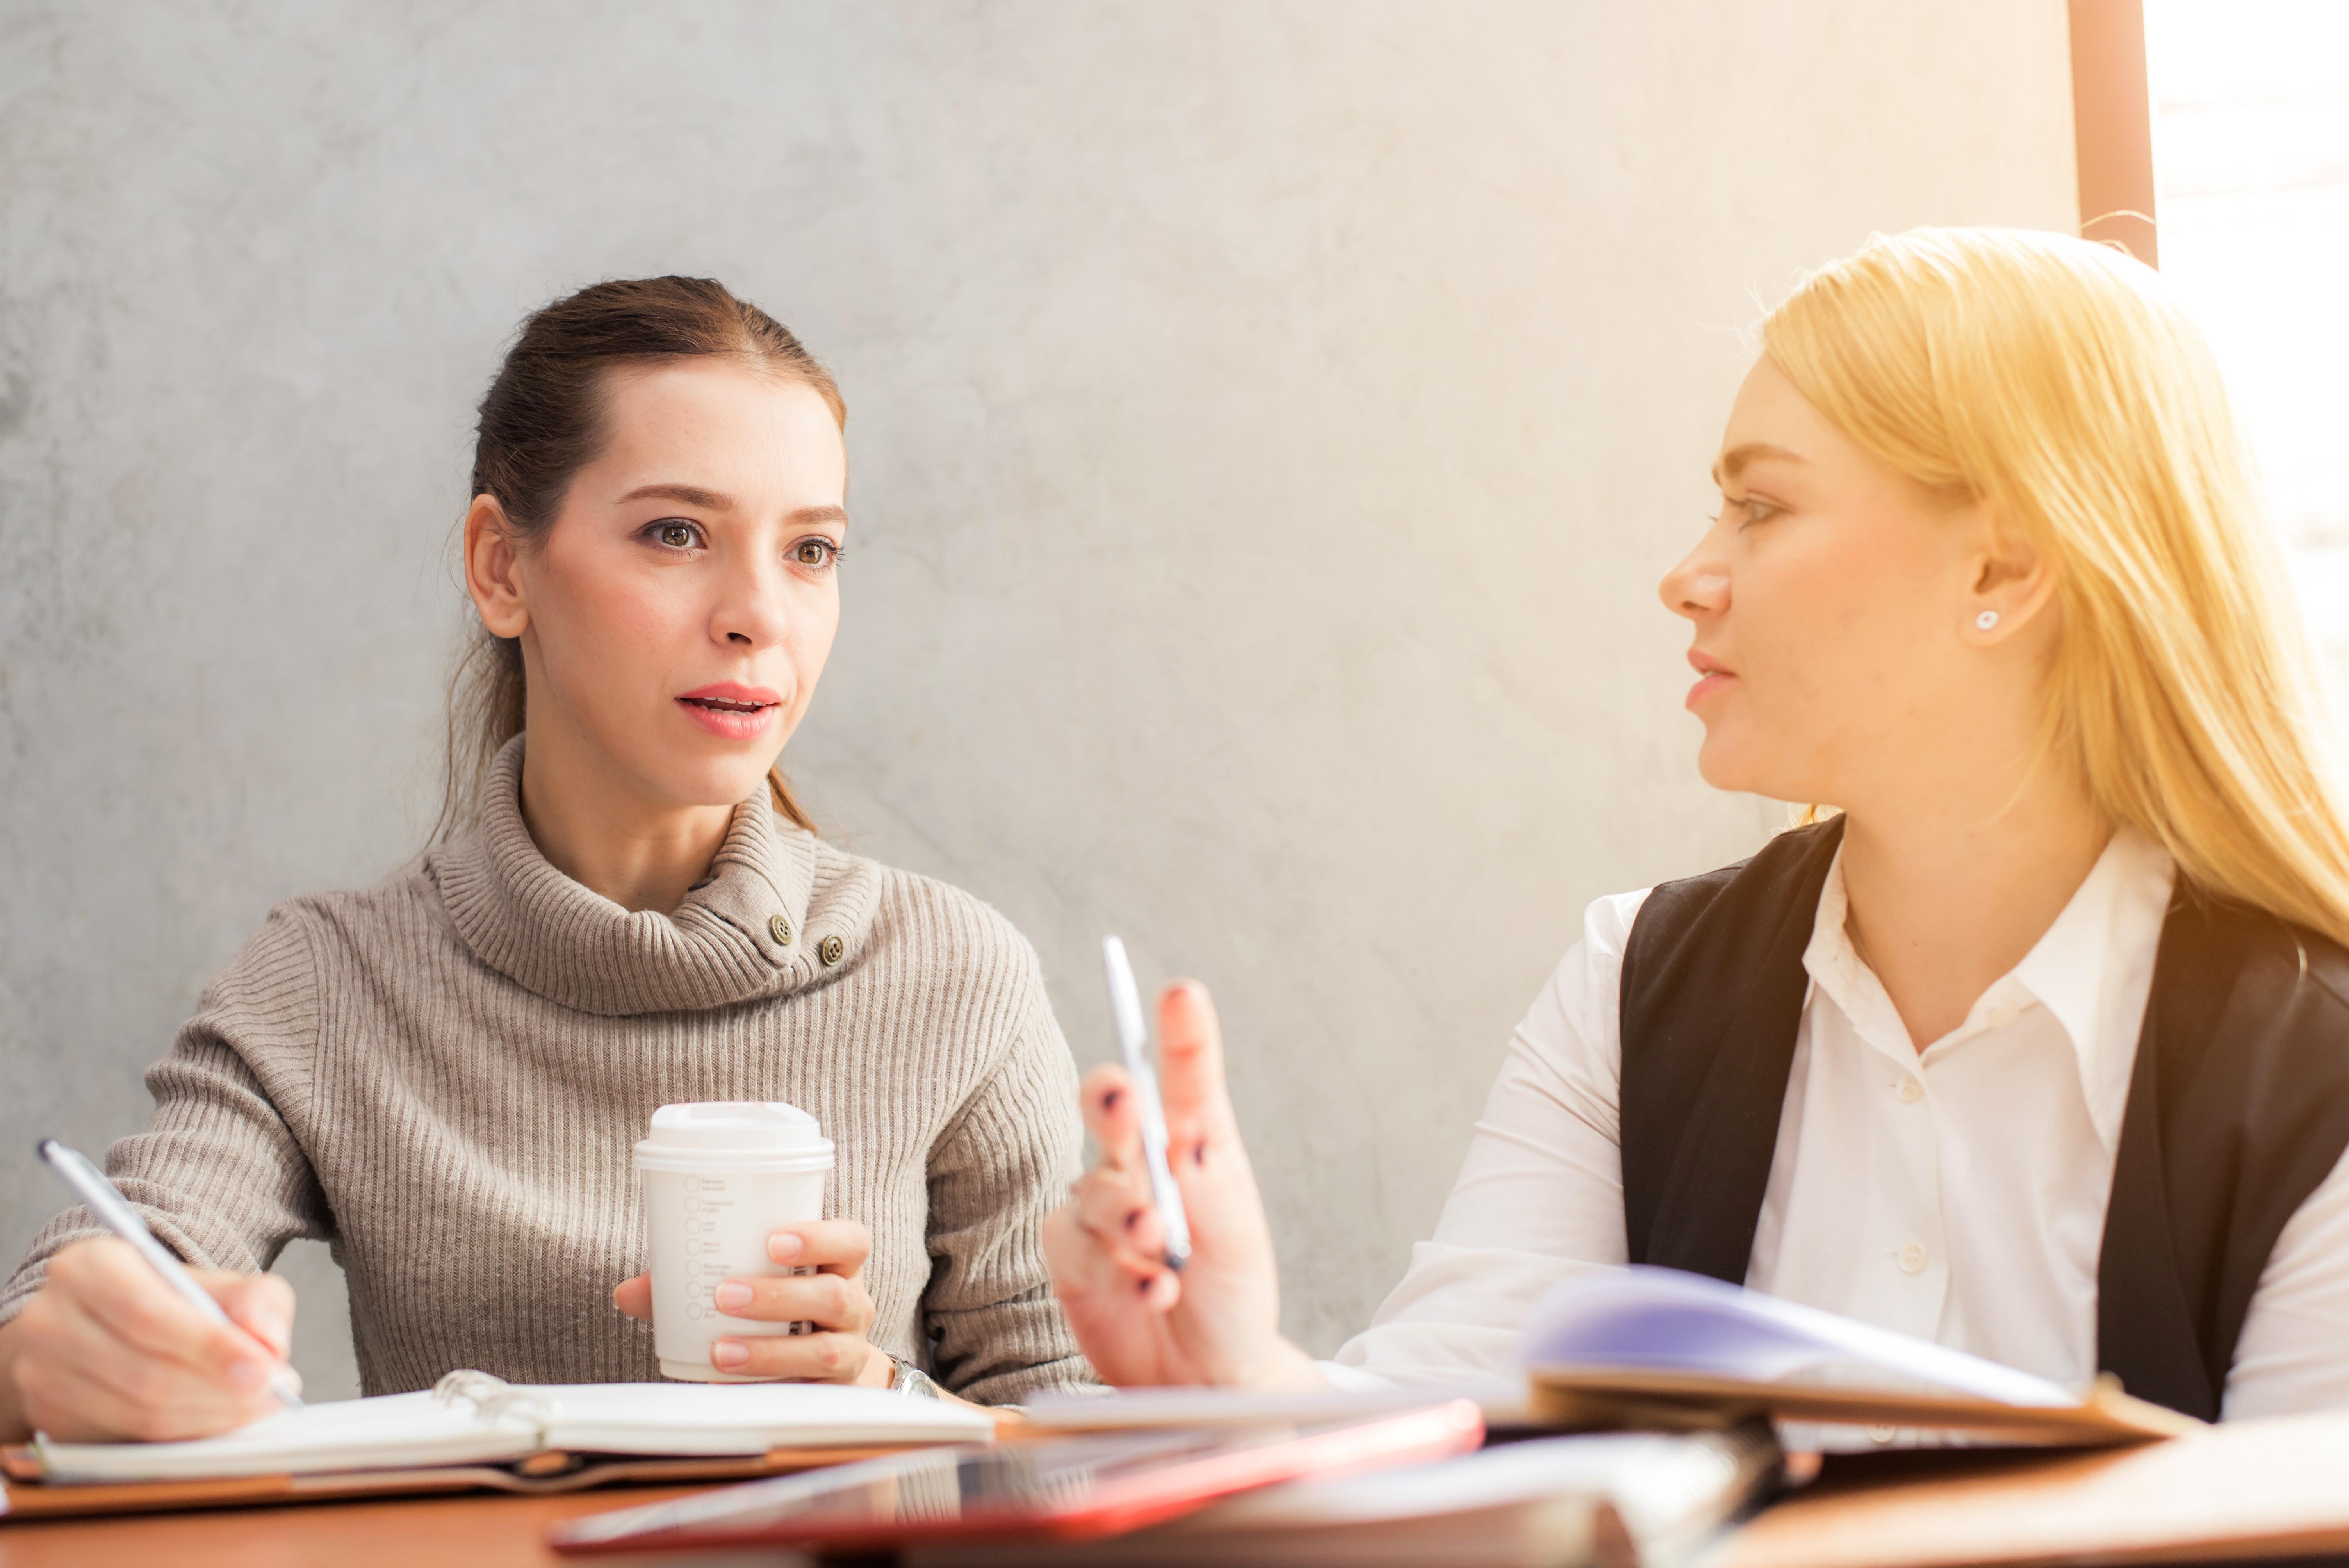 beautiful-brainstorming-businesswomen-601170